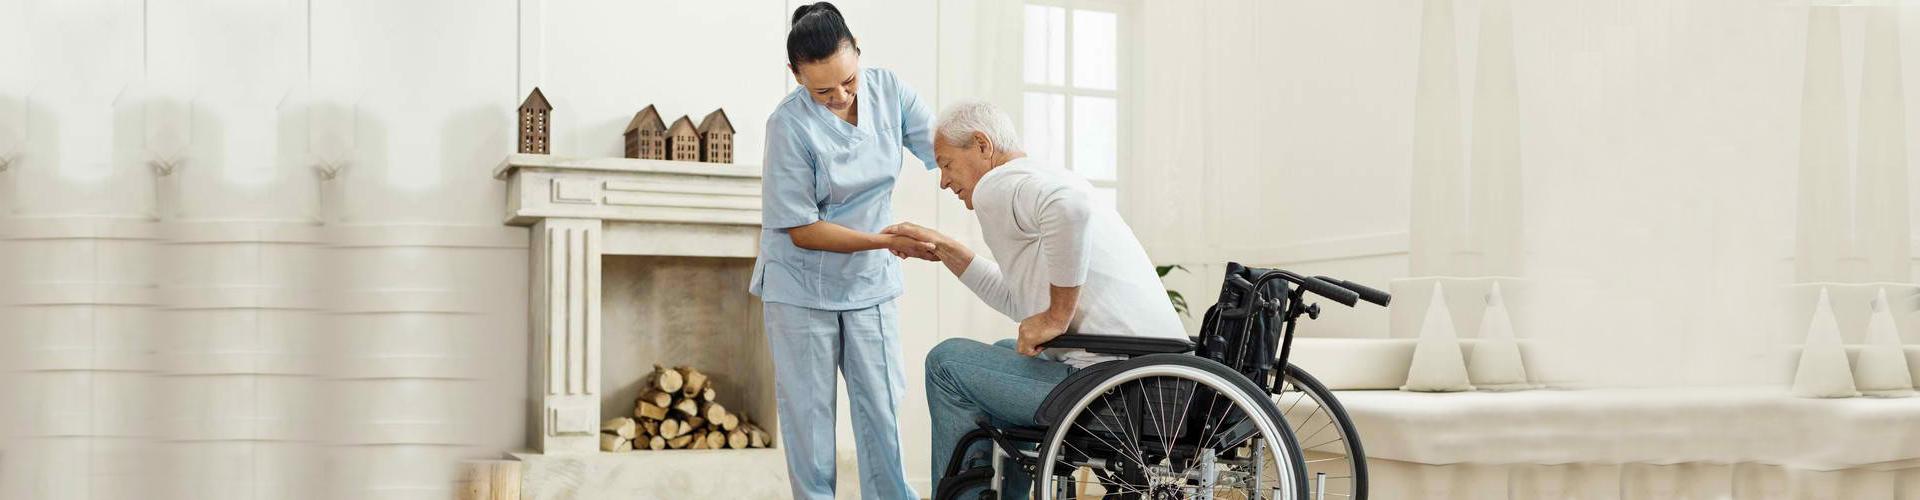 a caregiver helping a senior man stand